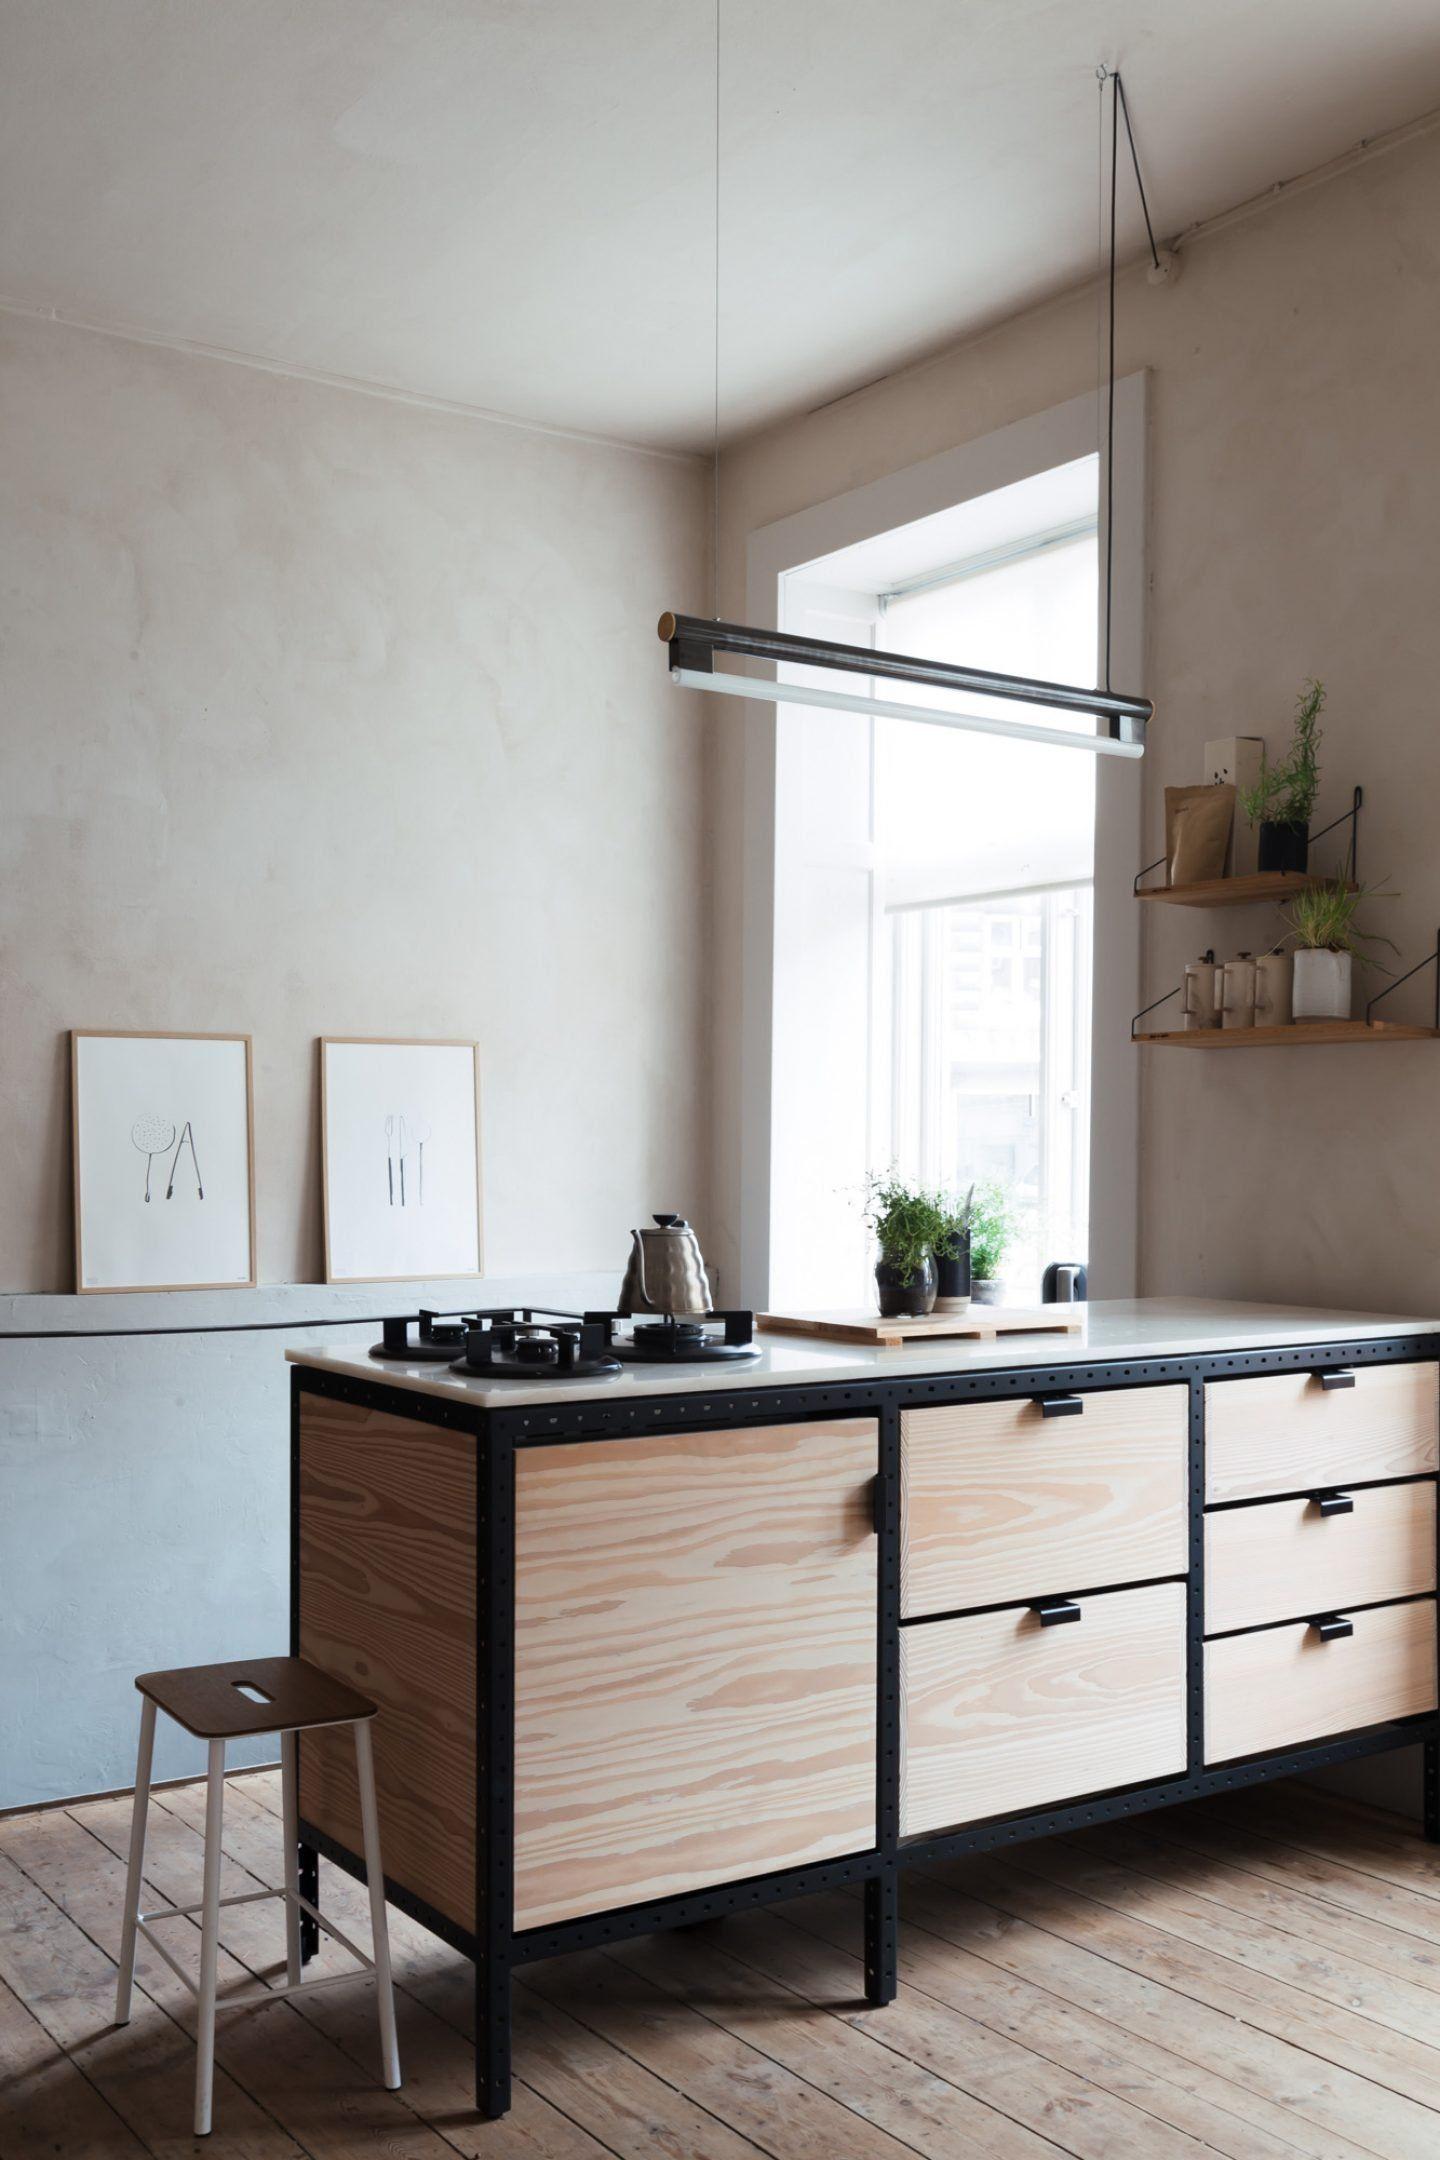 Frama kitchen. | Kitchen | Cocinas, Muebles, Cocina industrial